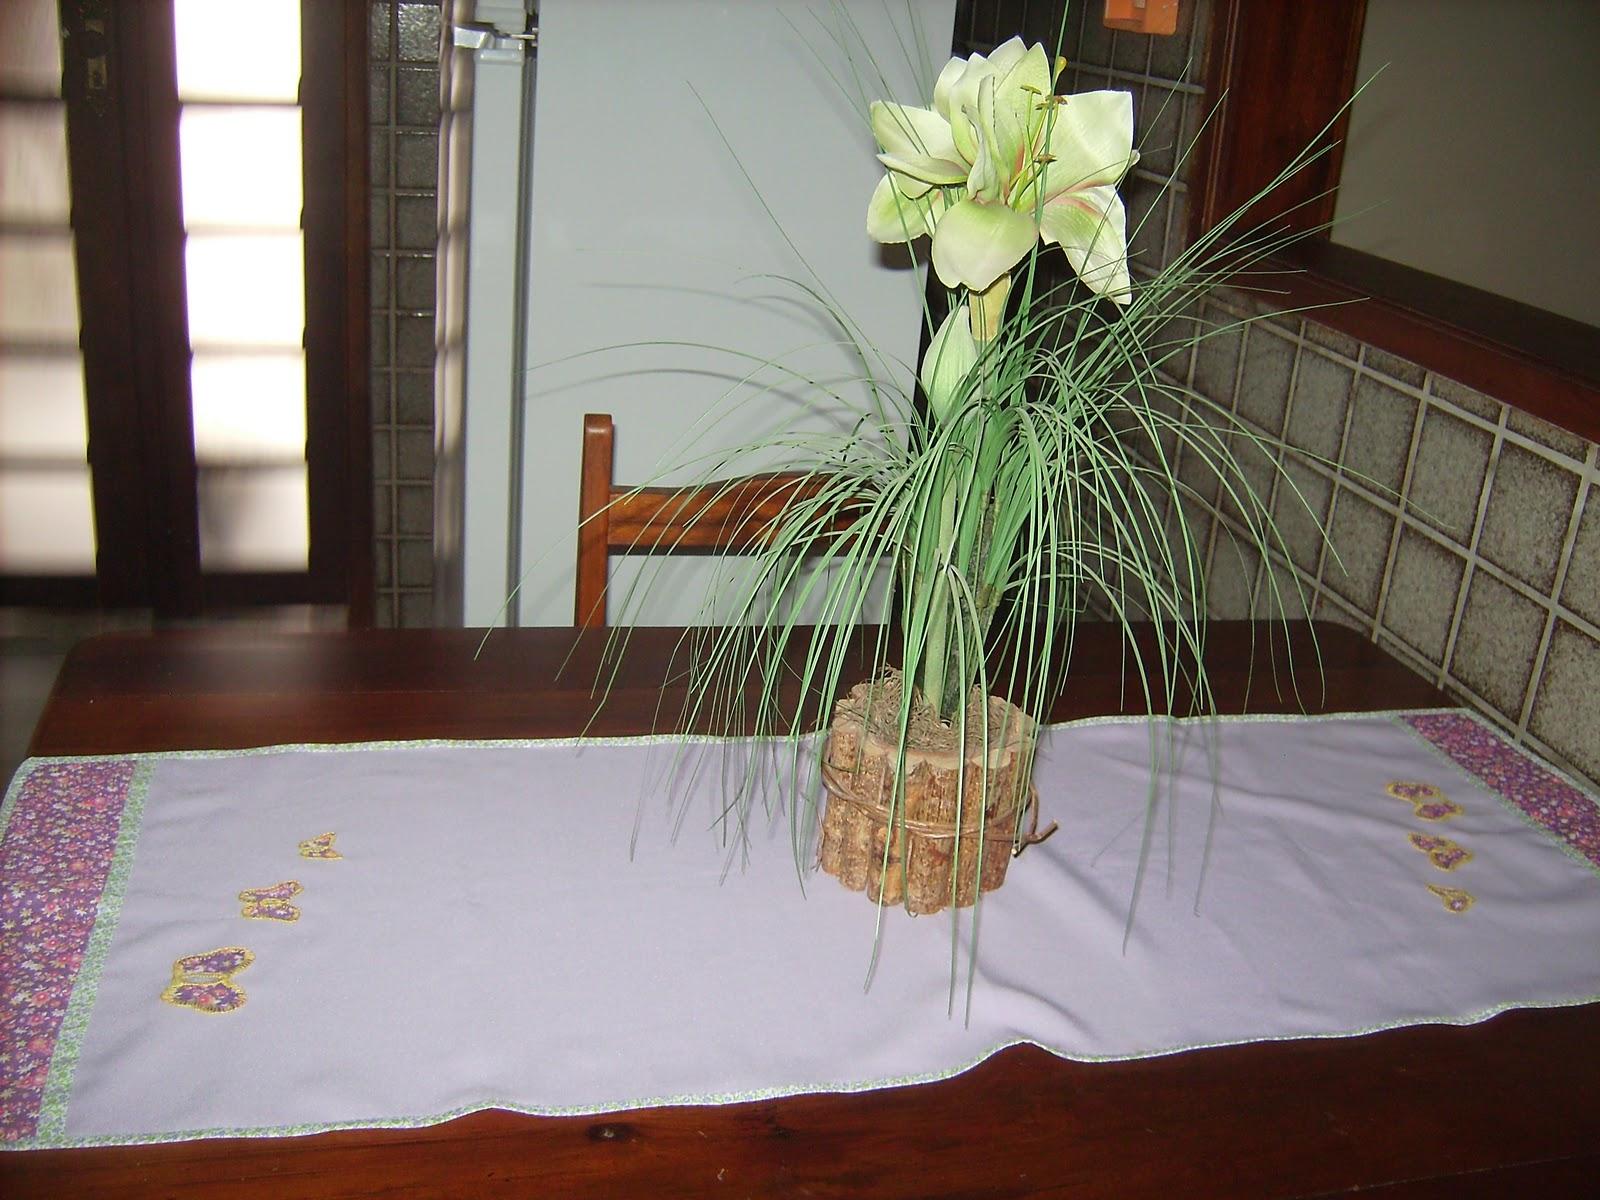 atelier sonhos de pano cj cozinha lilas borboletas. Black Bedroom Furniture Sets. Home Design Ideas